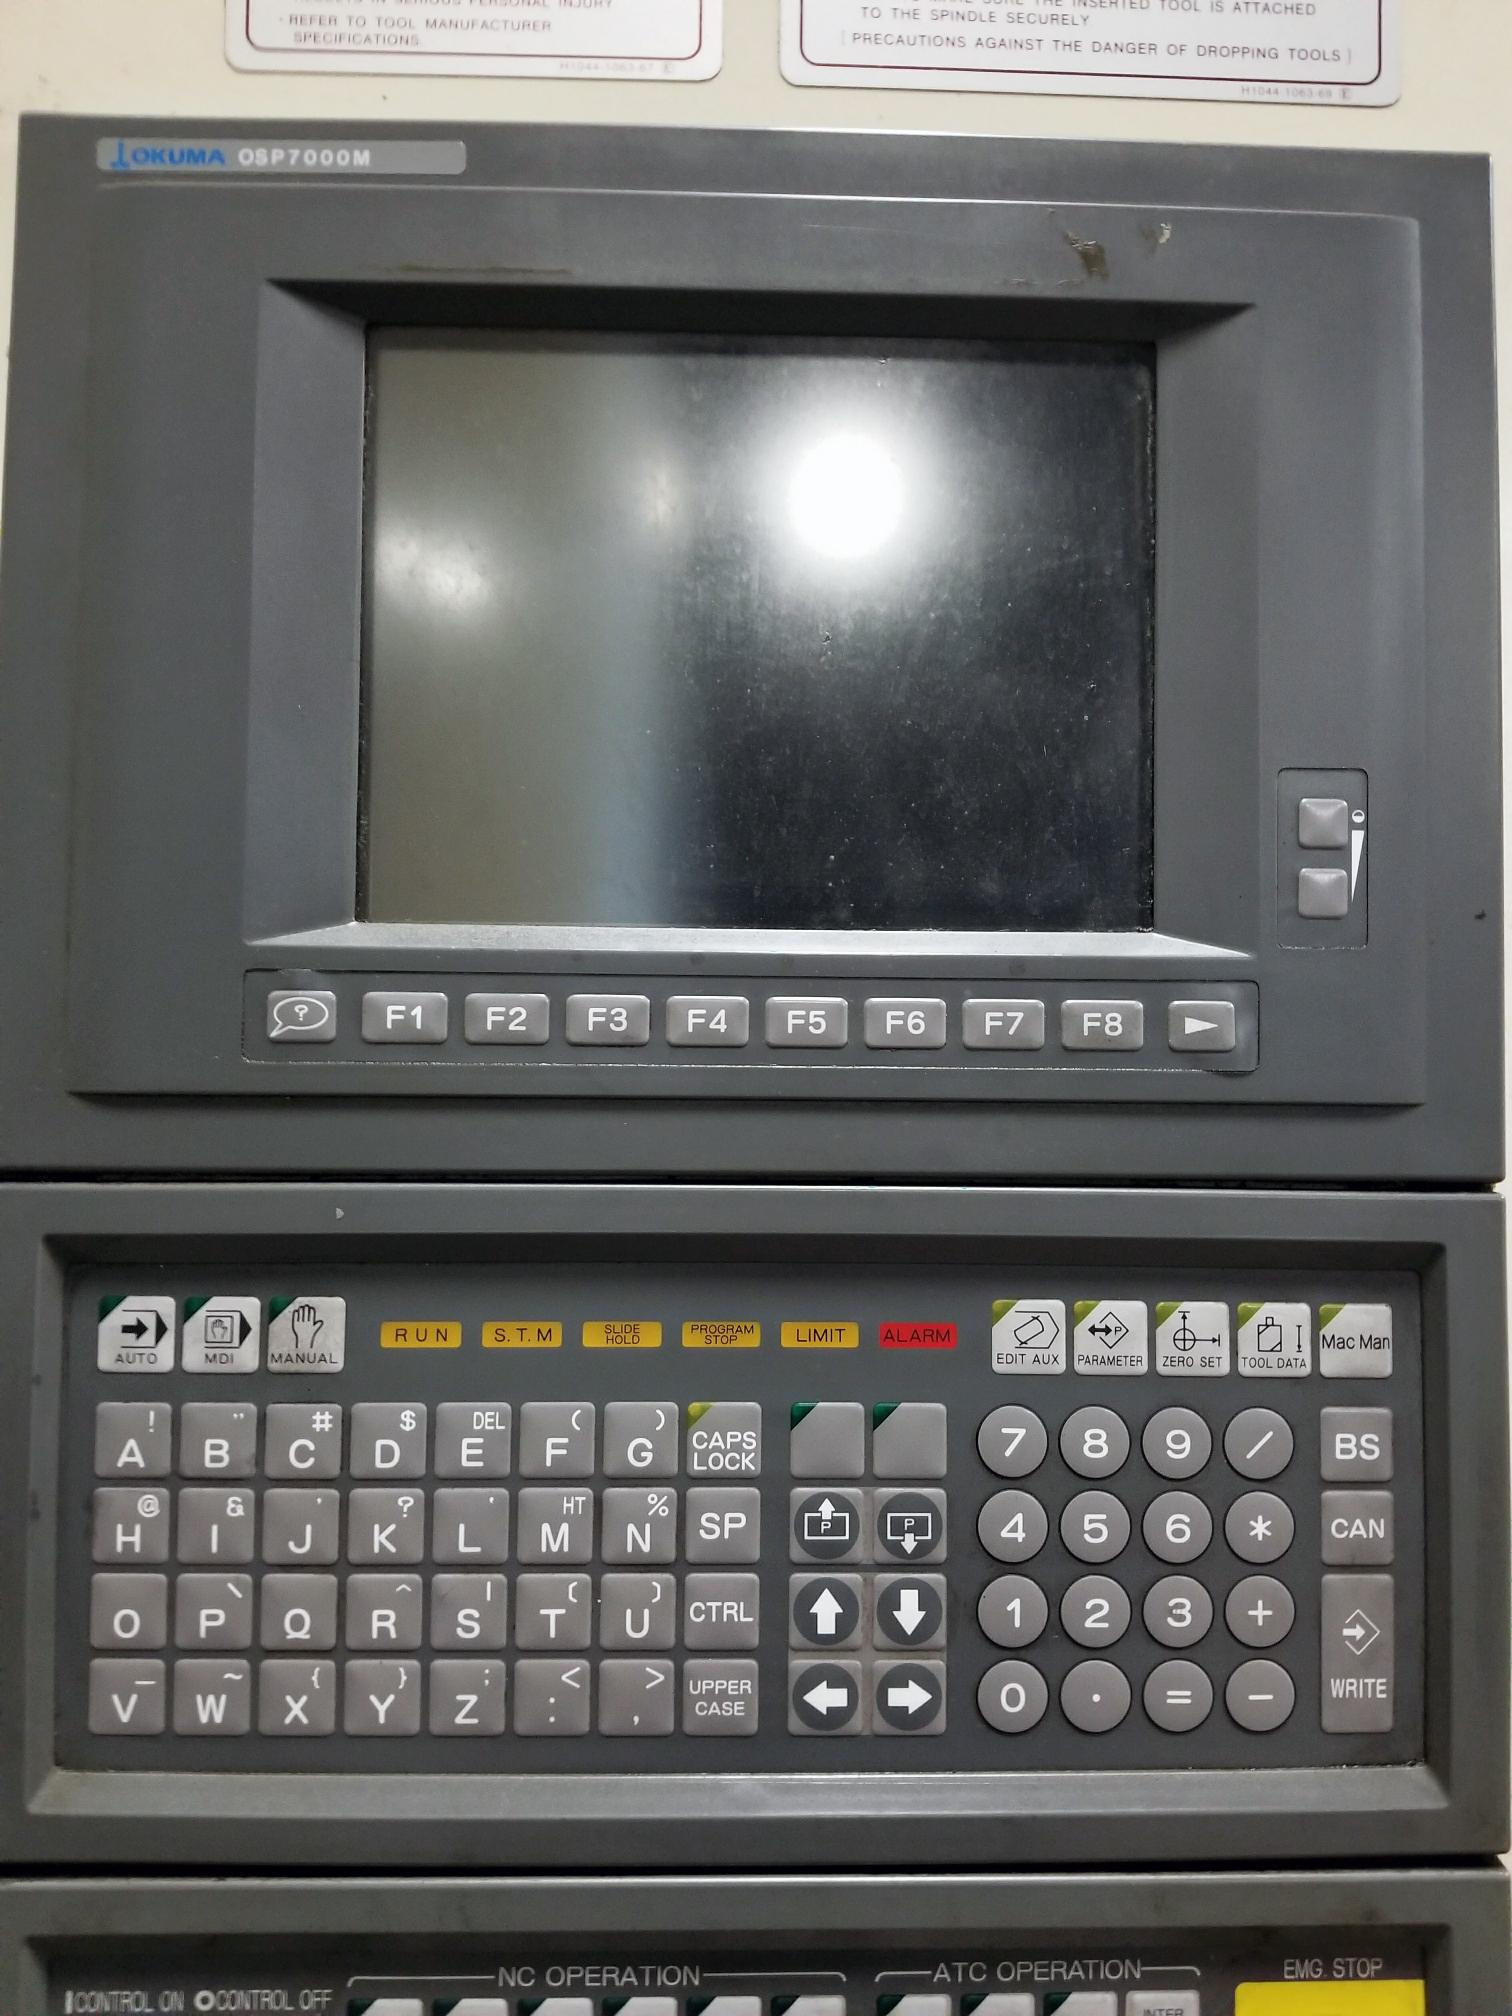 OKUMA MX50HB, DUAL PALLETS, OSP7000M CONTROL, ONE DEGREE, 5,000 RPM, THRU SPINDLE COOLANT, 1998